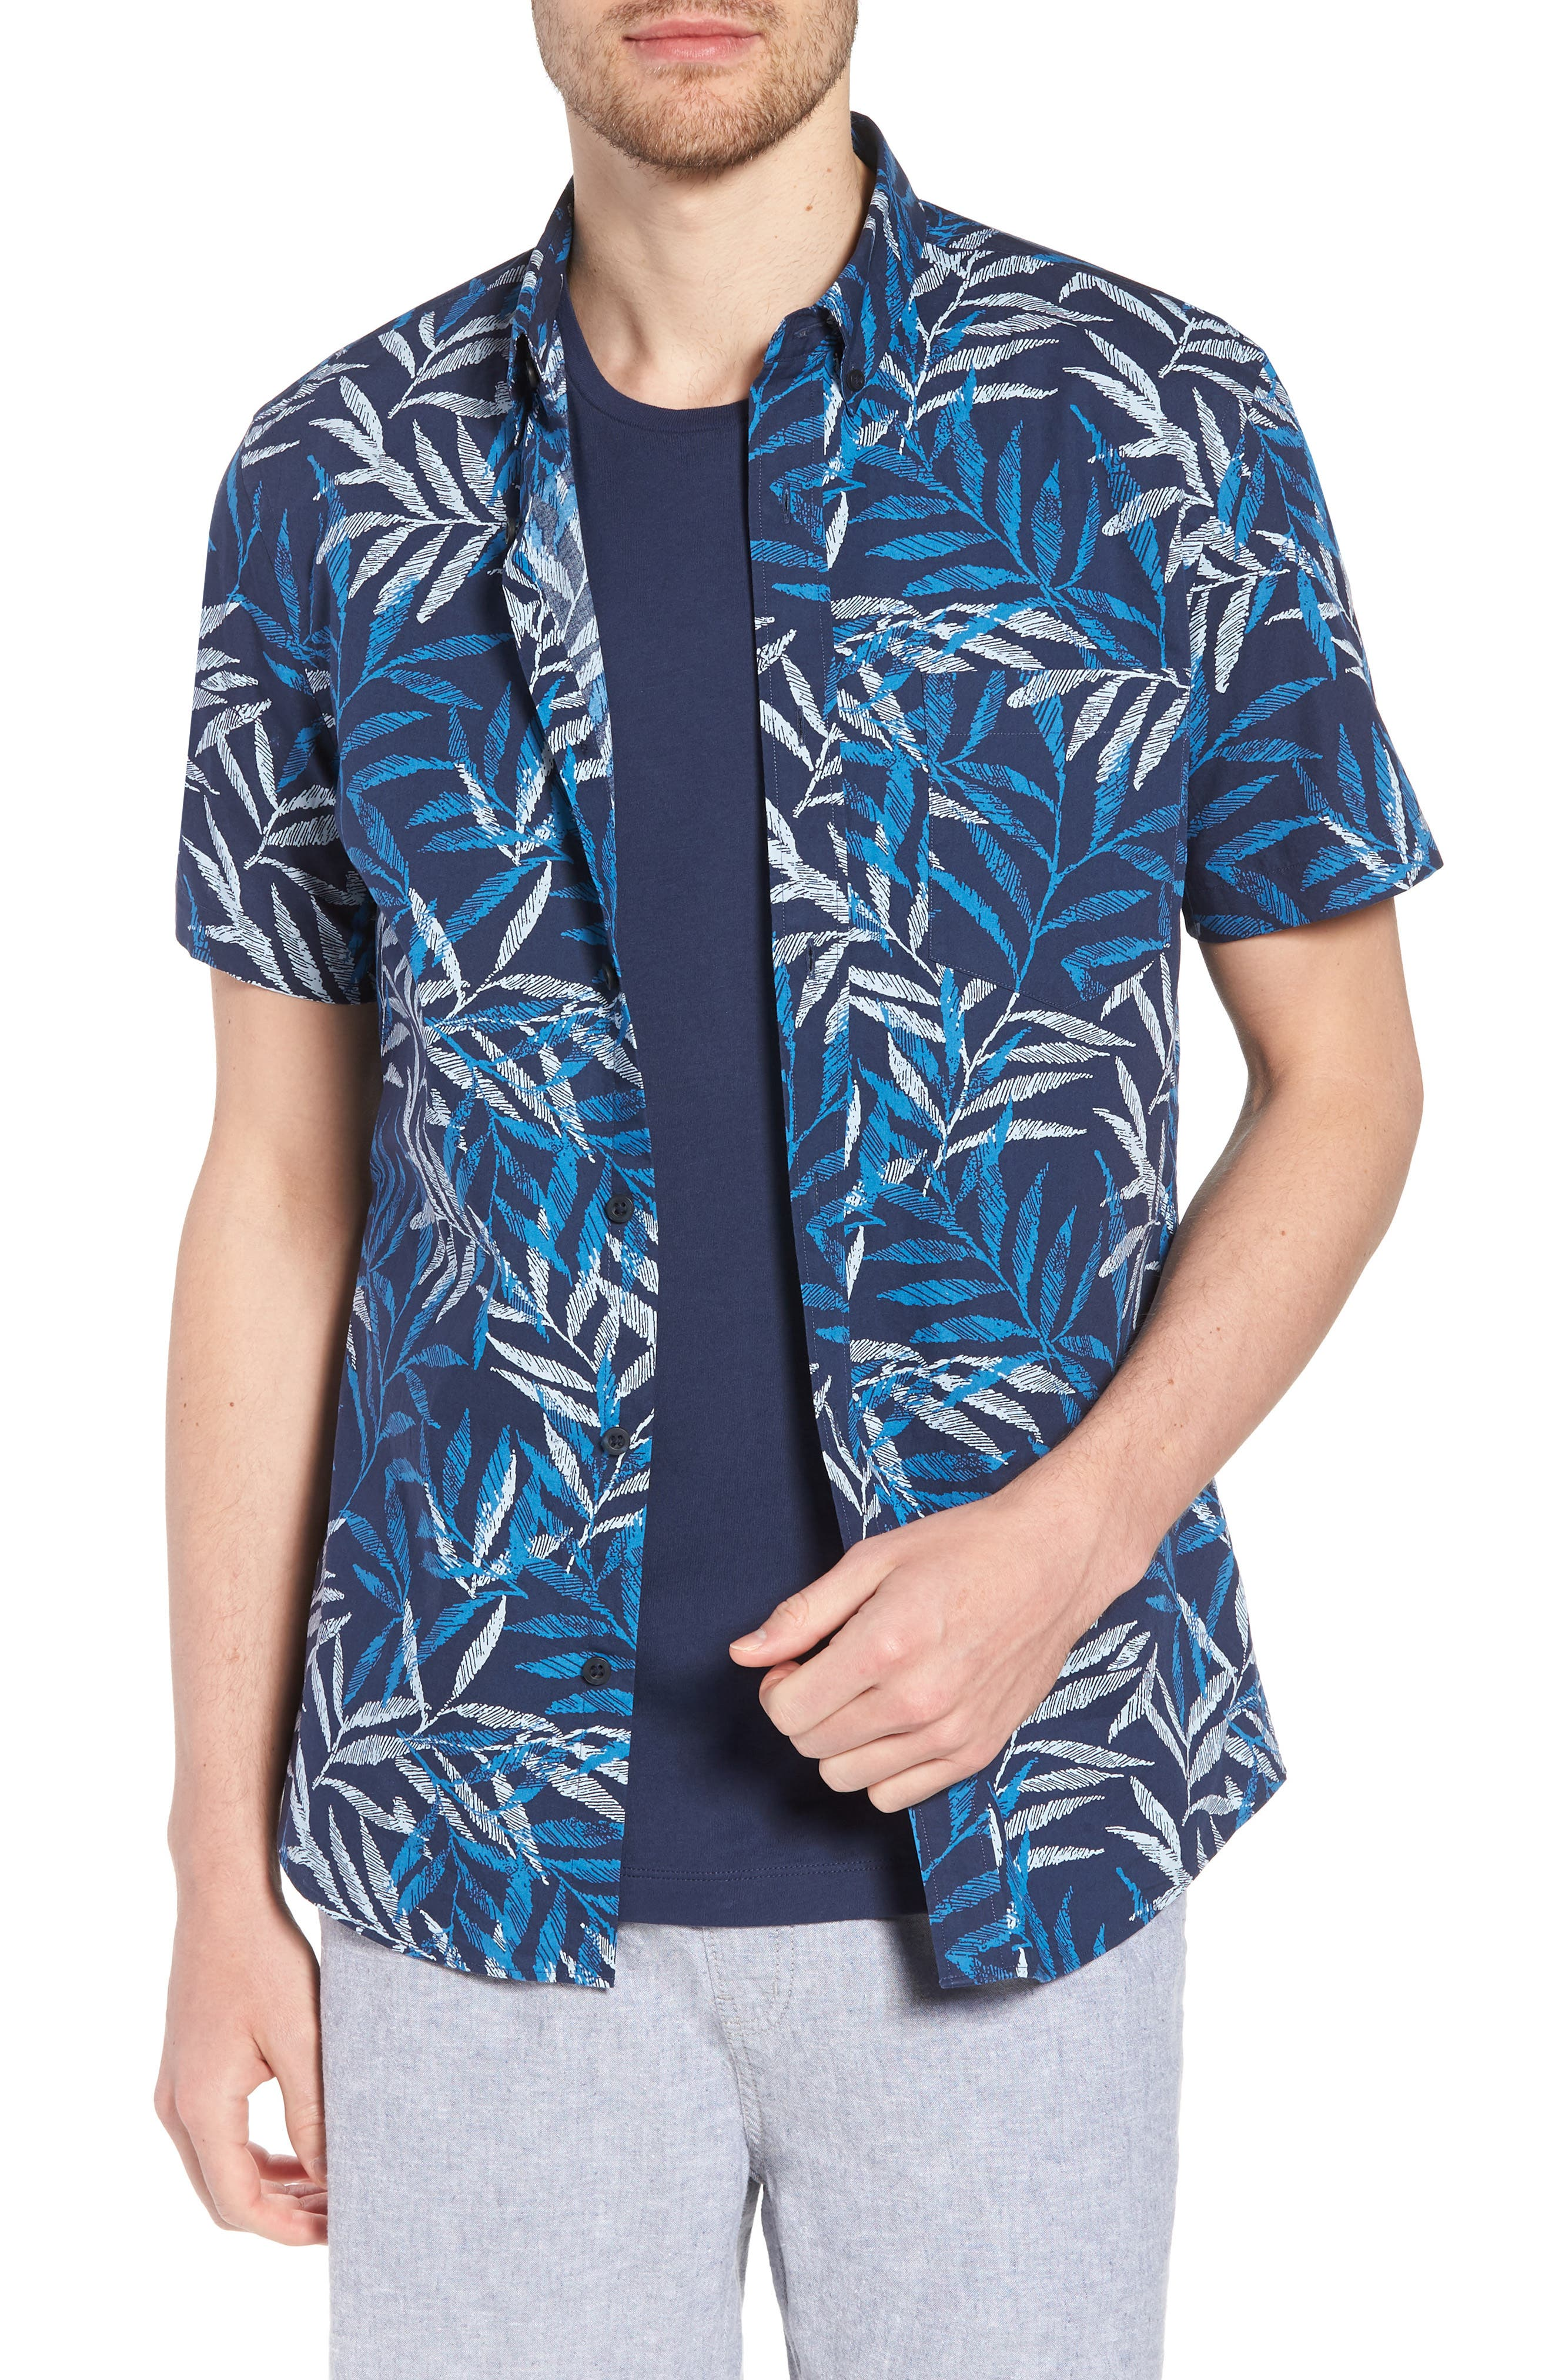 Trim Fit Print Short Sleeve Sport Shirt,                         Main,                         color, Blue Dark Etched Leaves